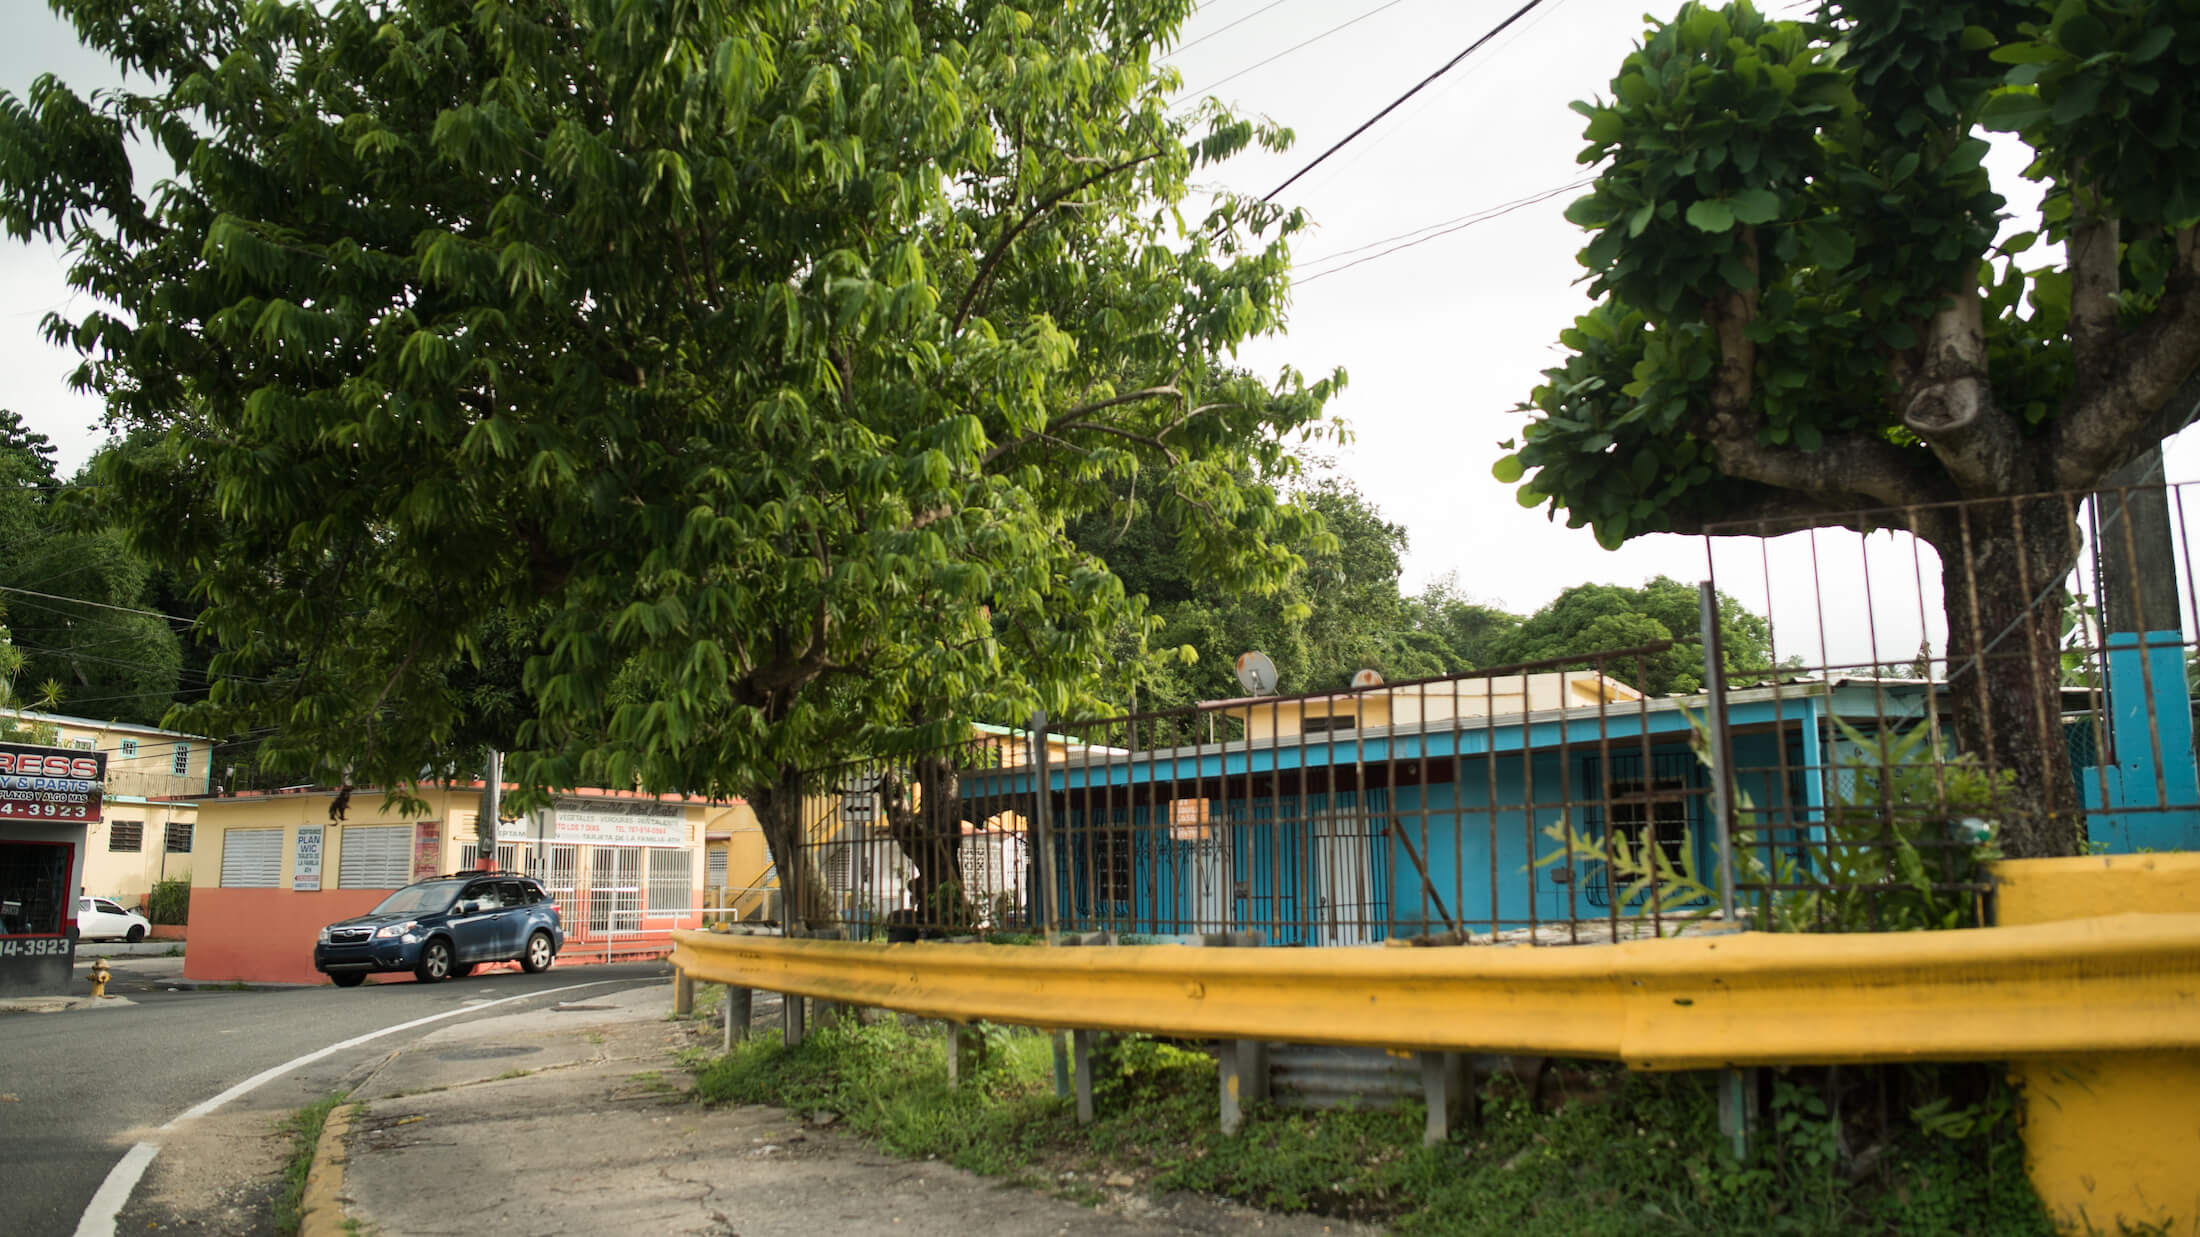 engle-olson-photography-puerto-rico-67.jpg